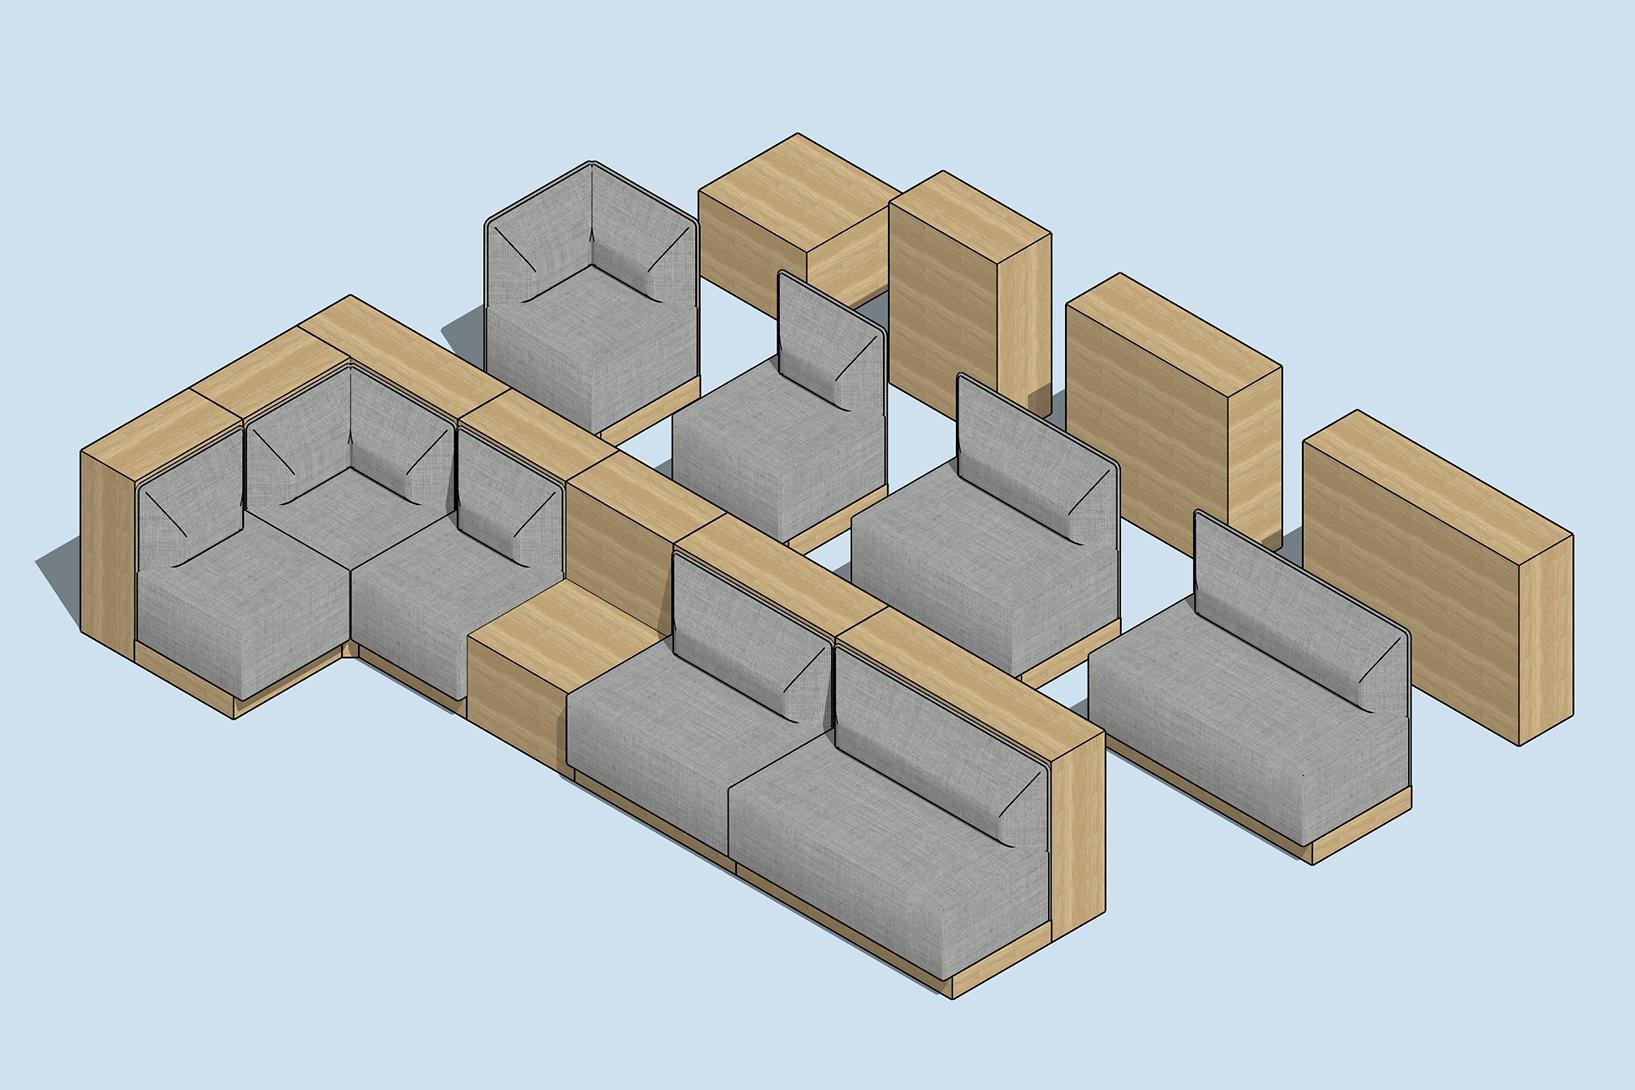 Bank Sofa deconstructed